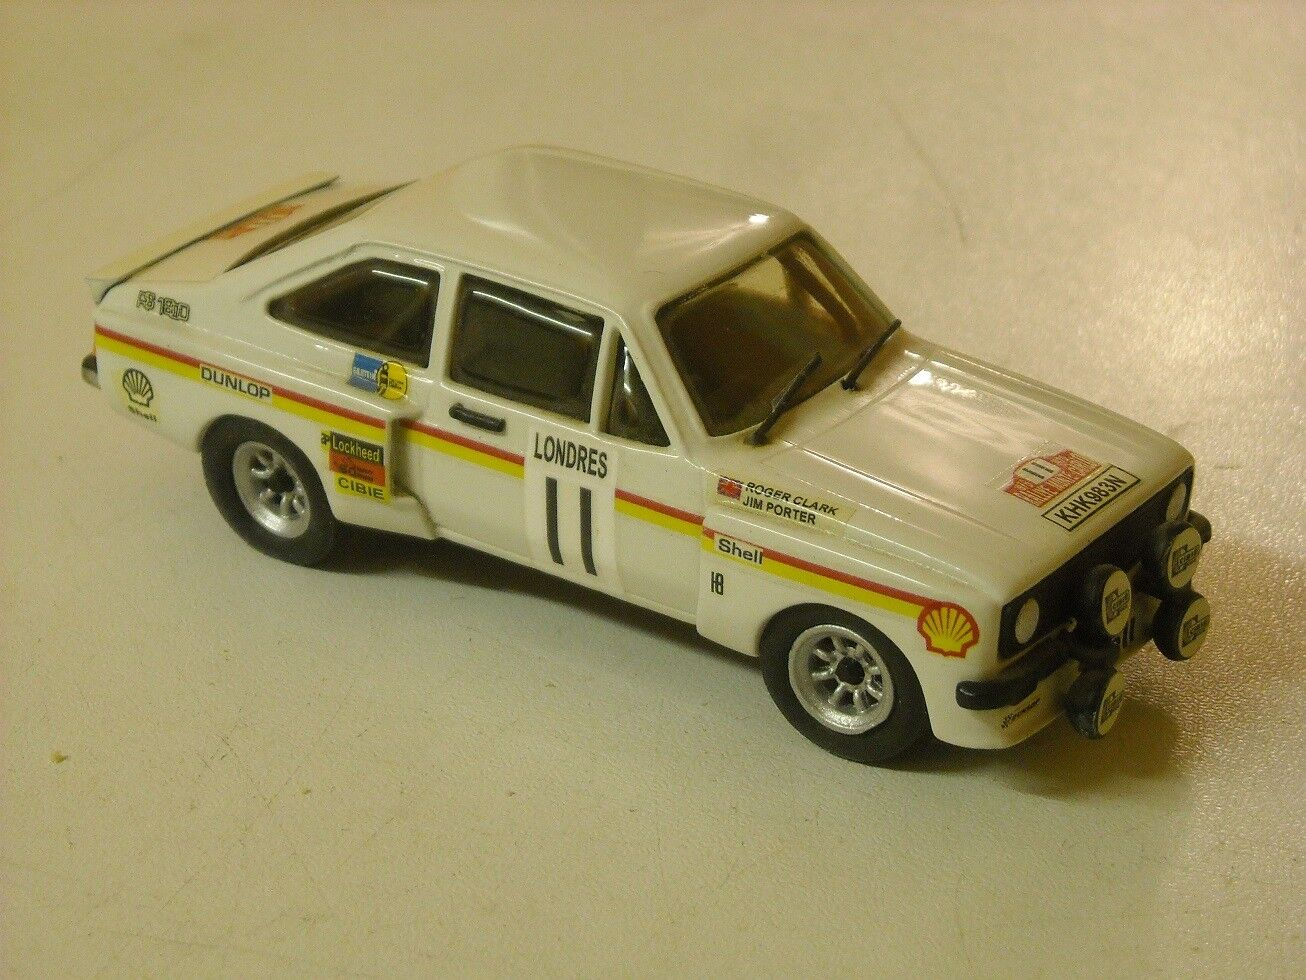 Ford Escort Mk2 Zakspeed Monte Carlo Rally 1976 Clarke built by K & R Replicas